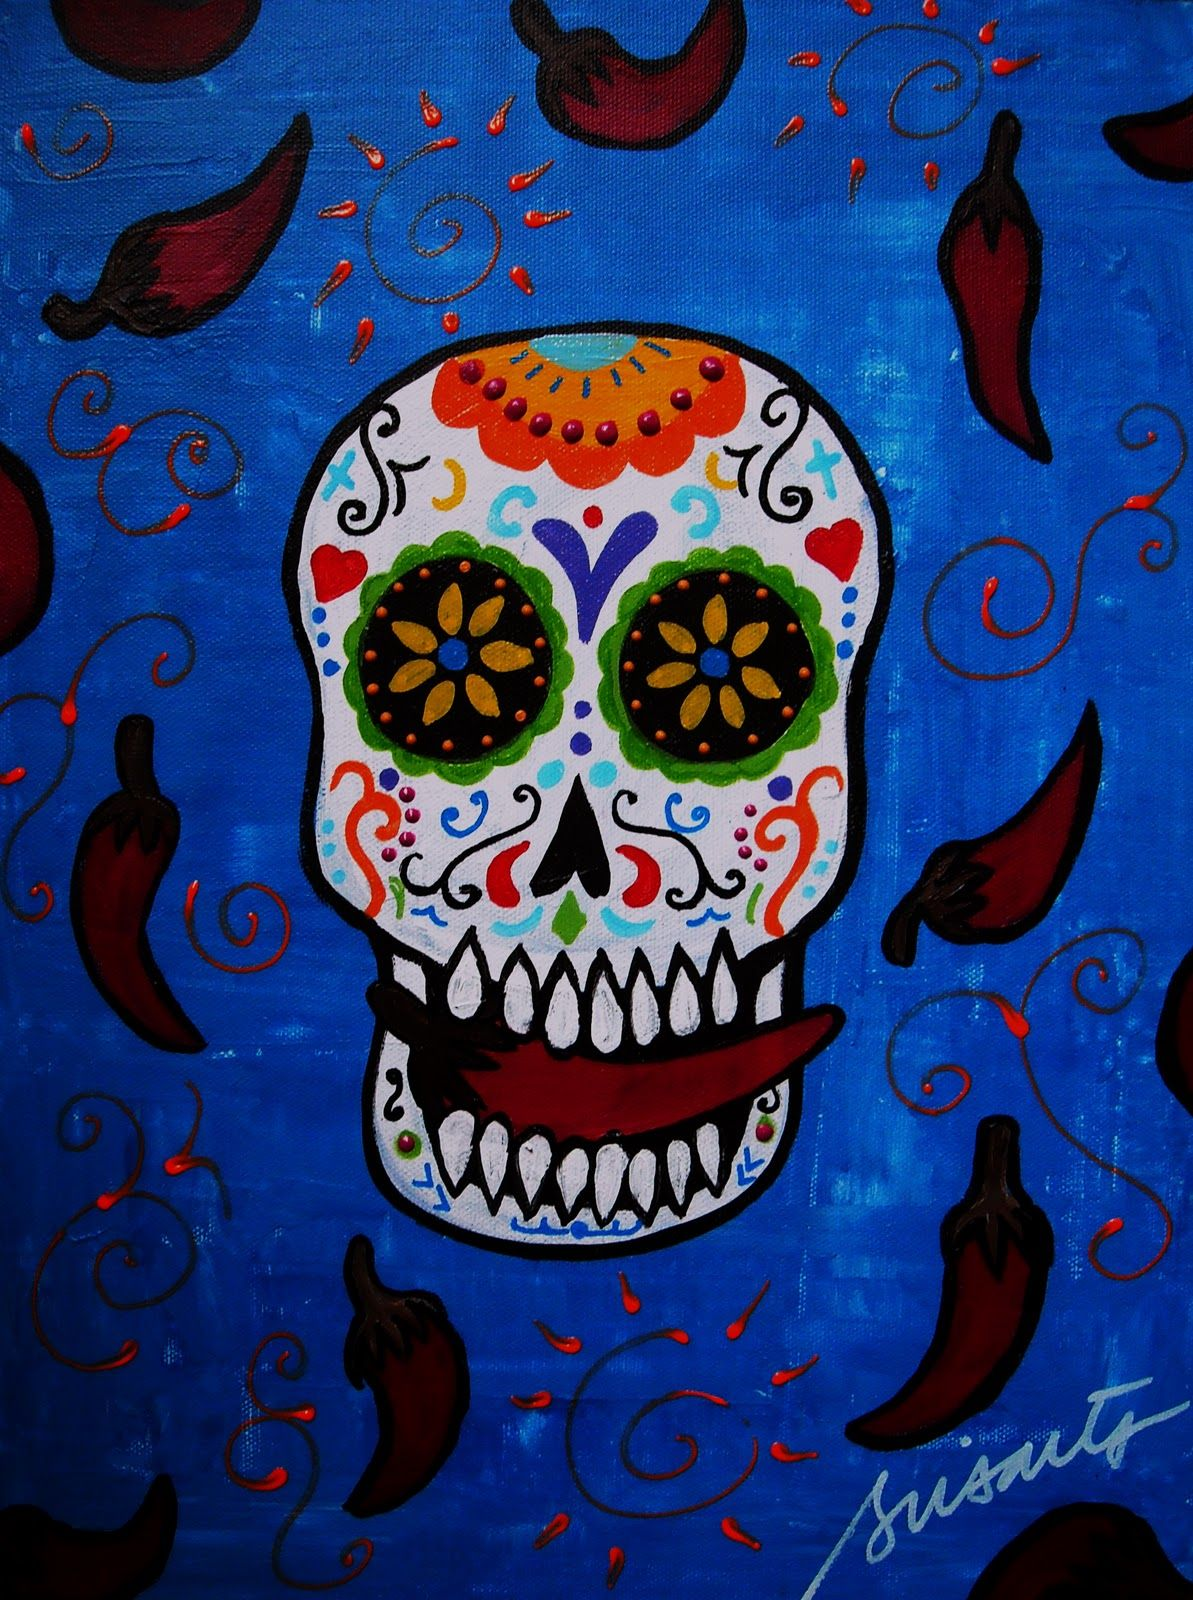 Mexican Art For Sale Online Turkus New Original Mexican Folk Art Paintings For Sale B Mexican Folk Art Painting Mexican Folk Art Art Paintings For Sale